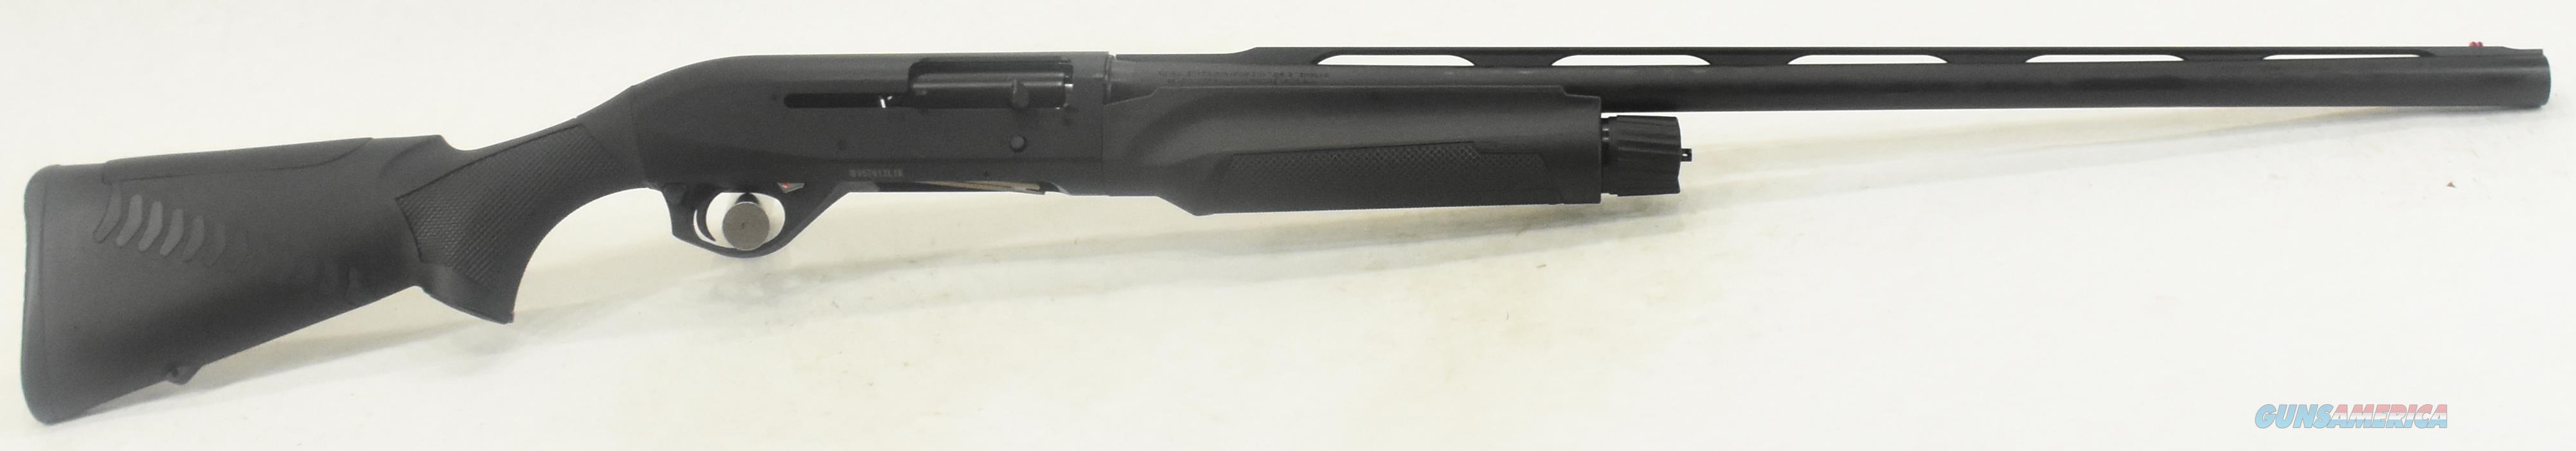 11017 Benelli M2 Field Compact Black 12 Ga 26-3In  Guns > Shotguns > Benelli Shotguns > Sporting